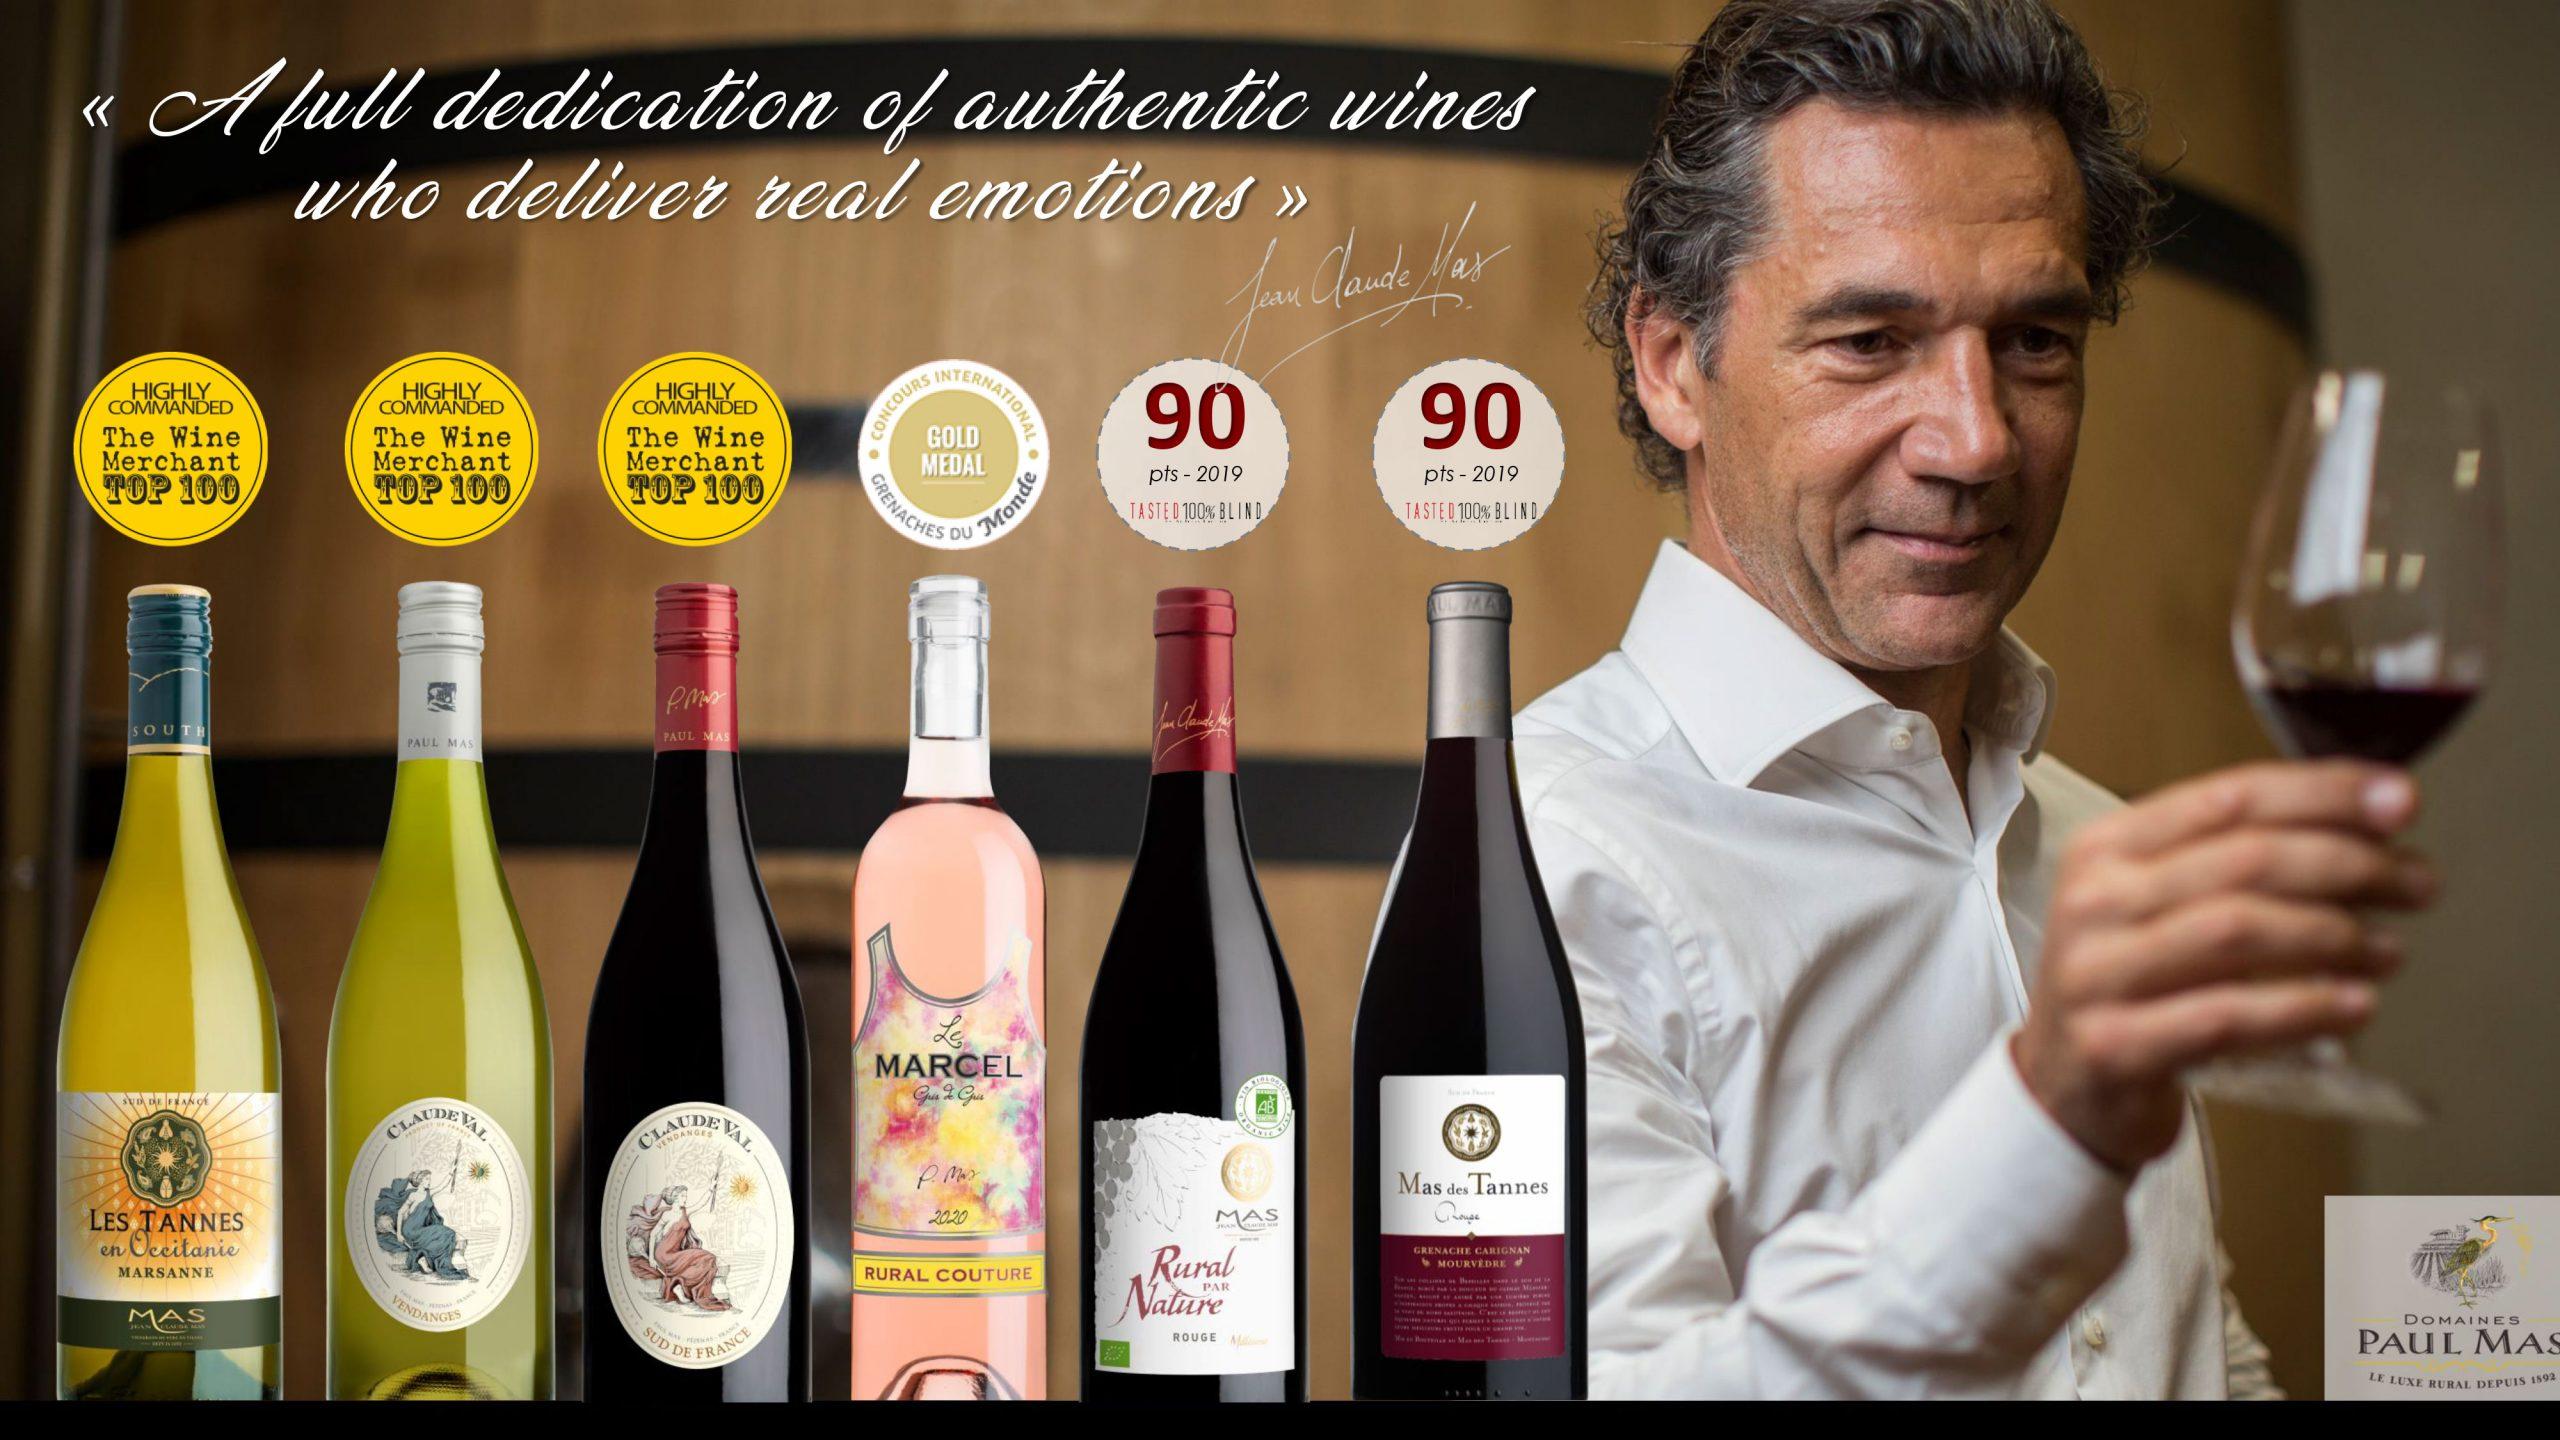 Scores  Domaine Paul Mas wines